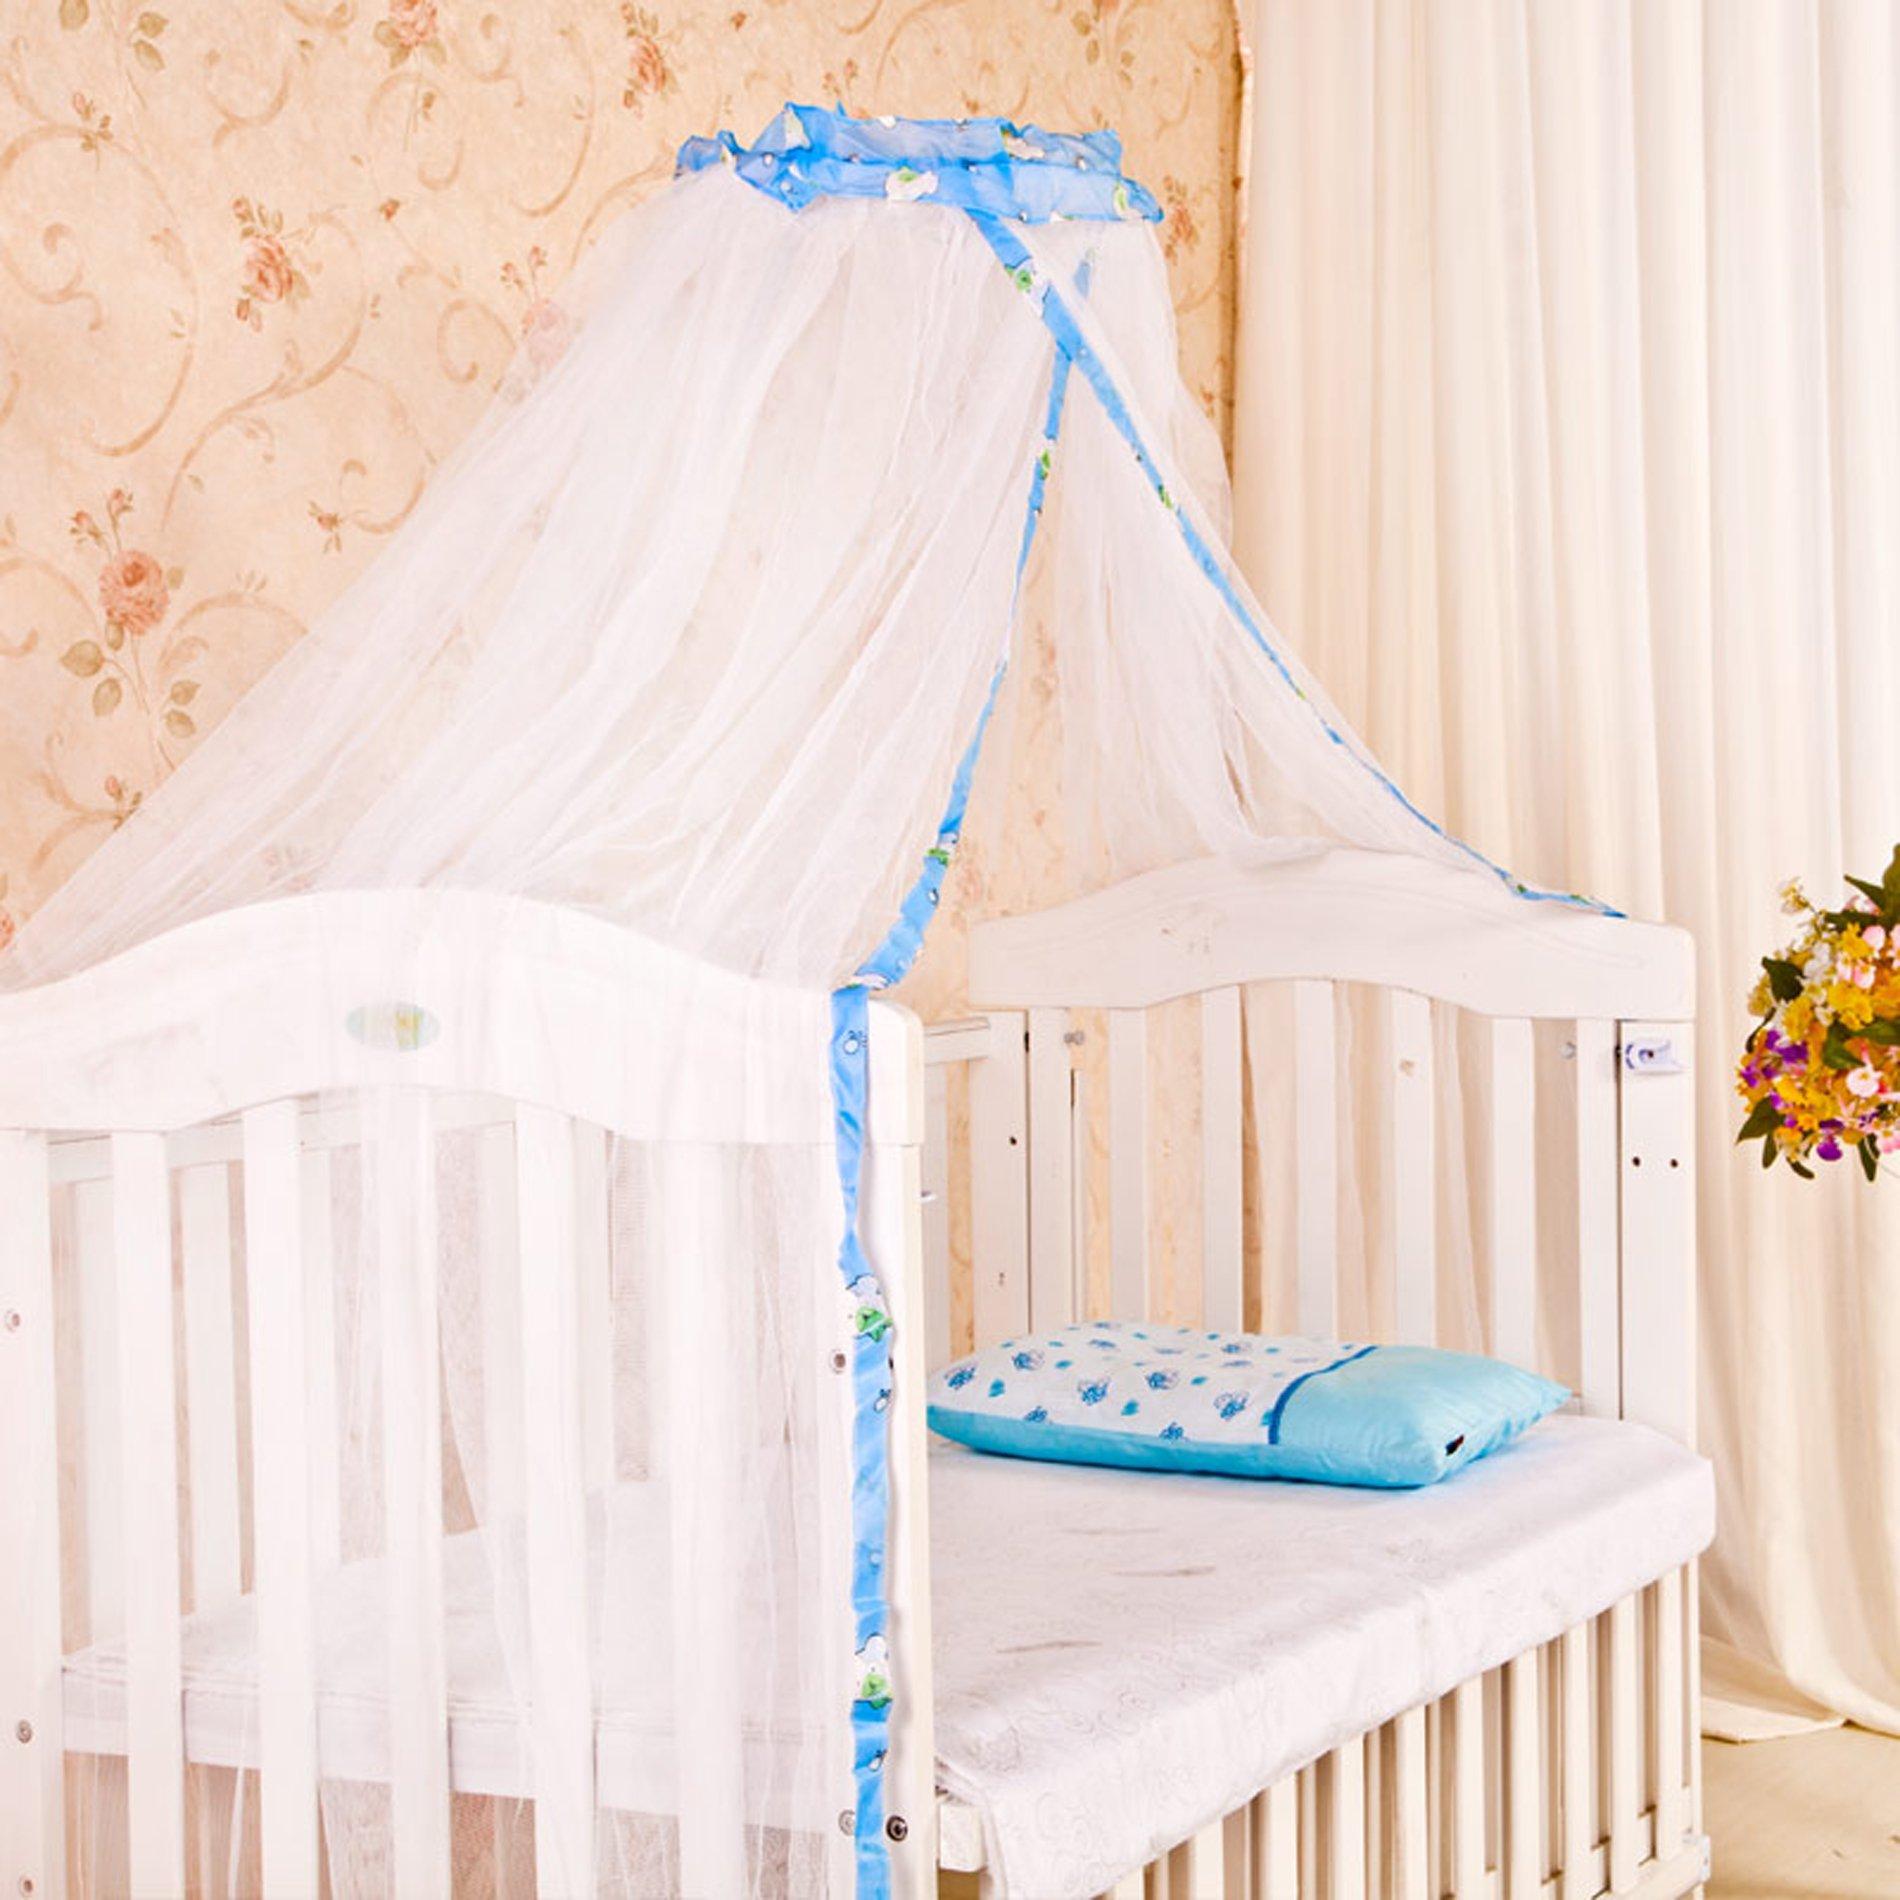 - White Baby Cot Bed Canopy Mosquito Net - Buy Online In Burundi